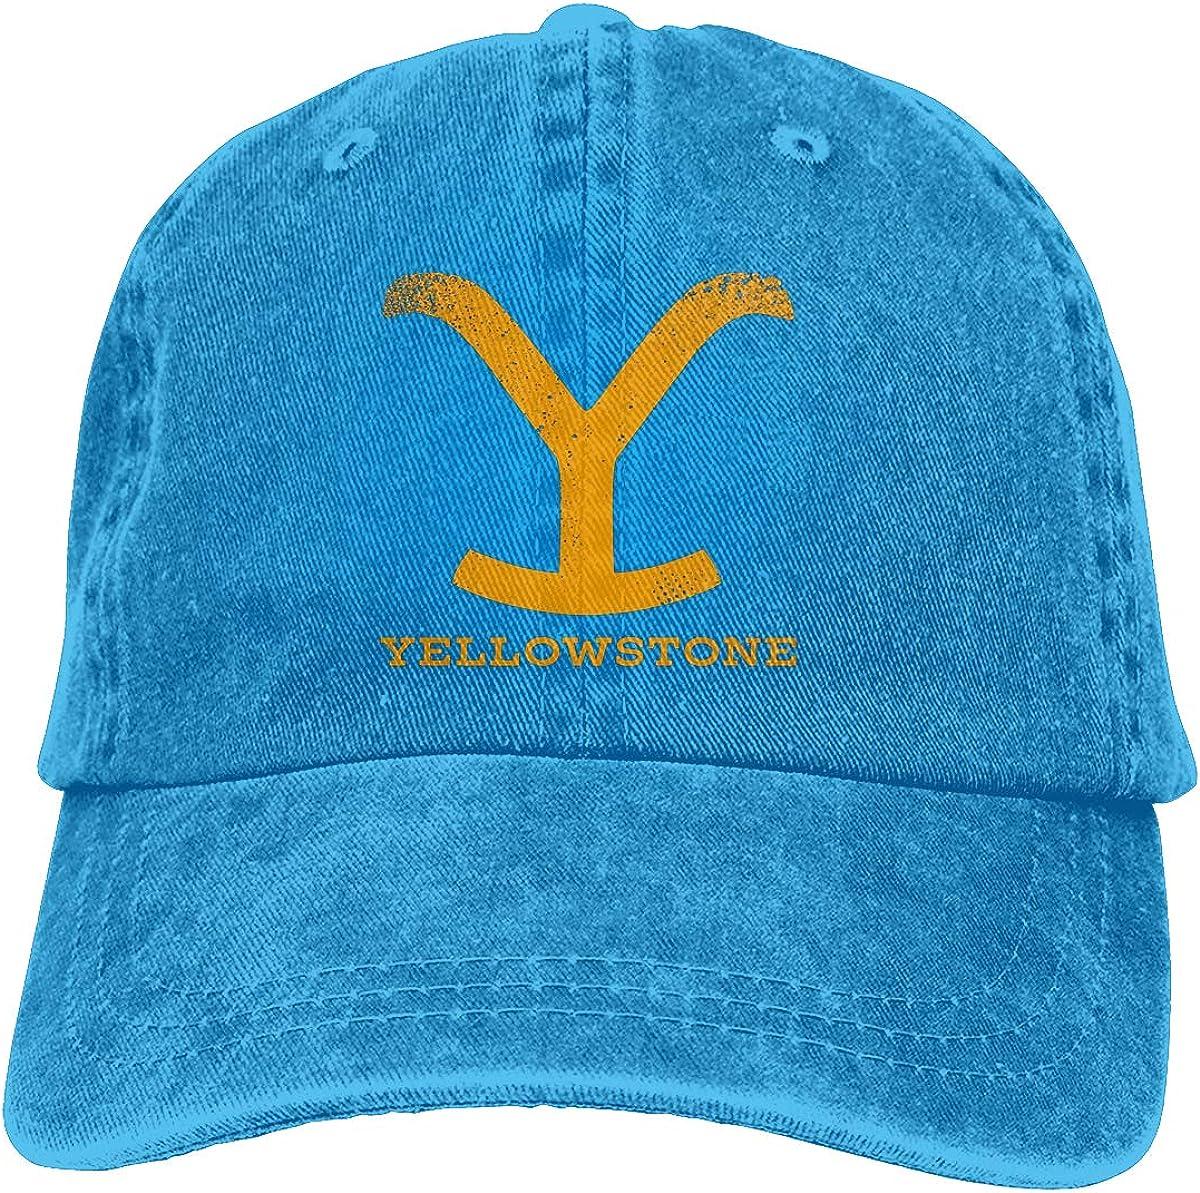 jkhhy Yellowstone Unisex Baseball Cap Adjustable Comfortable Cap Vitage Hat,Navy